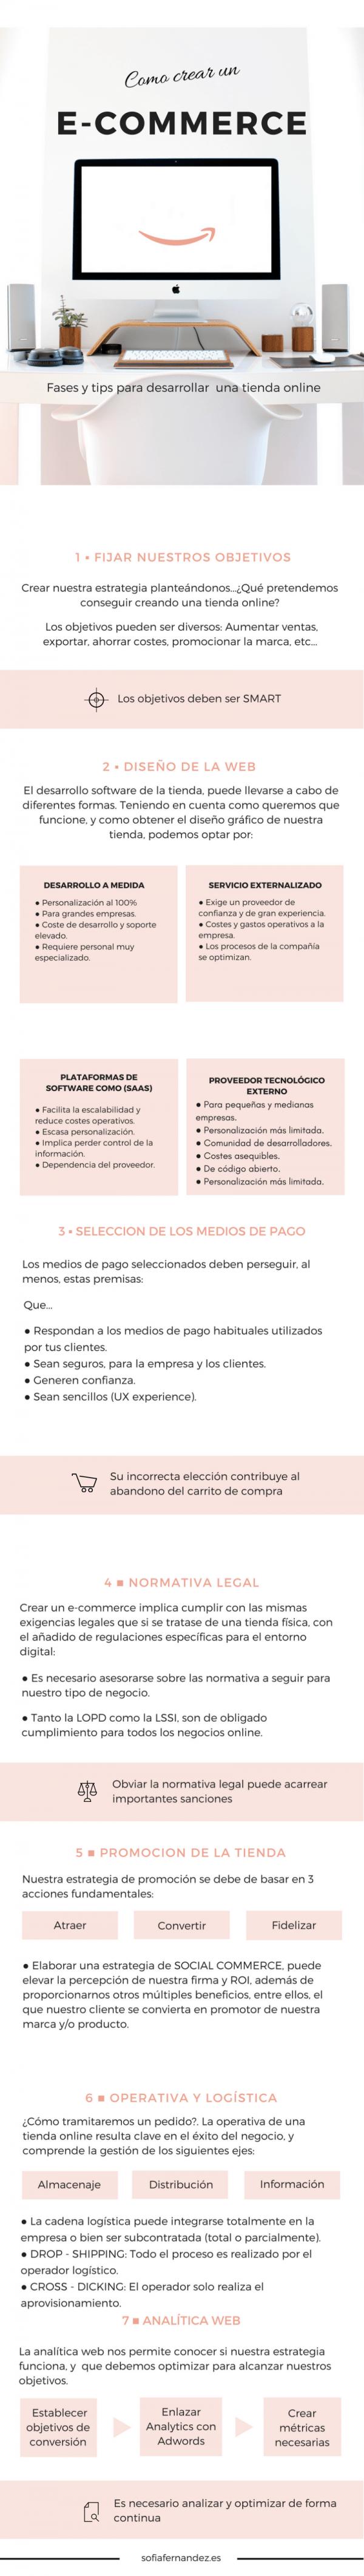 infografía consejos para la creación de un e-commerce